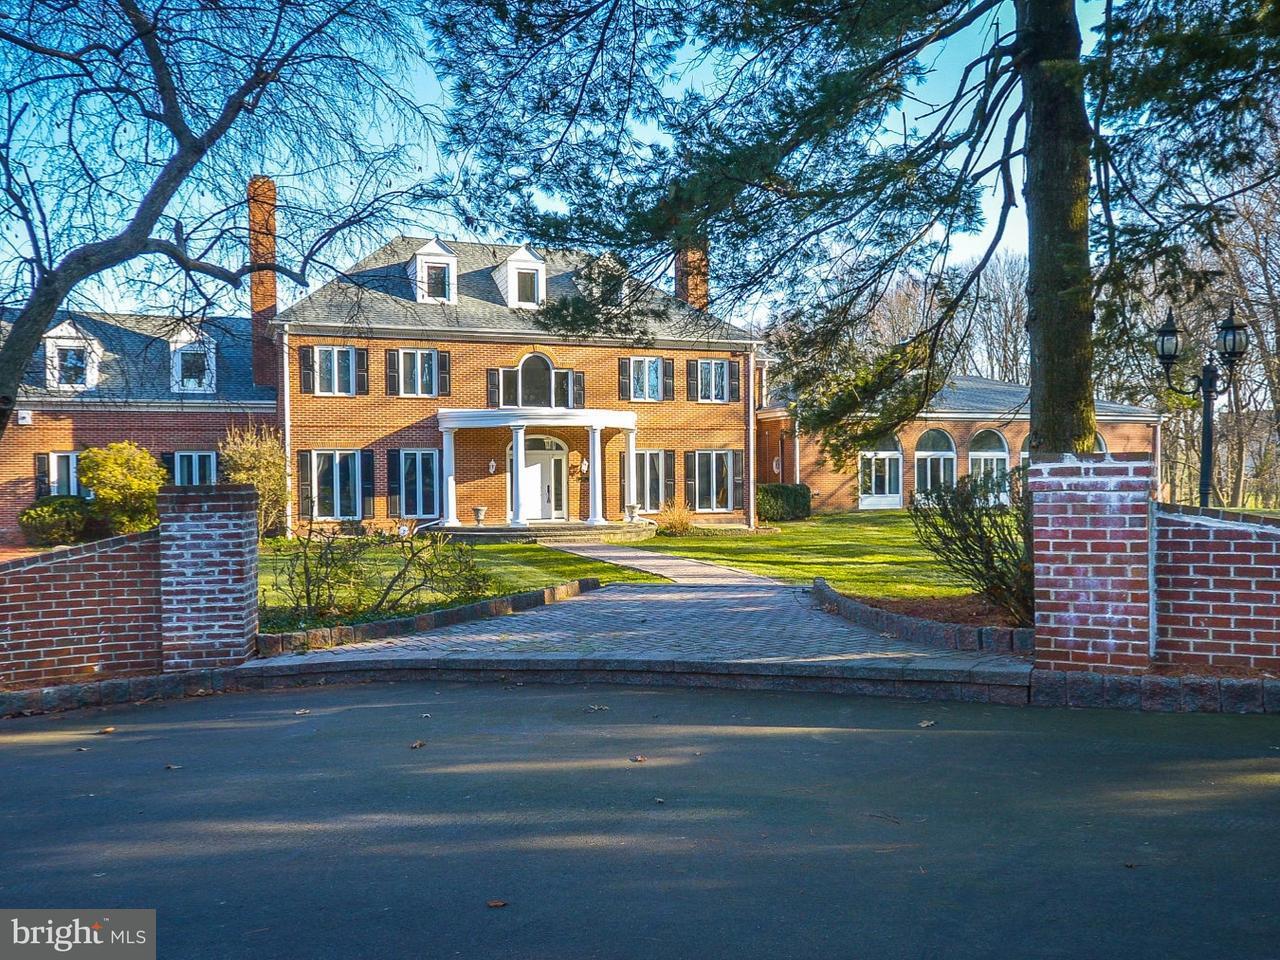 Moradia para Venda às 460 ROELOFFS Road Yardley, Pensilvânia 19067 Estados Unidos